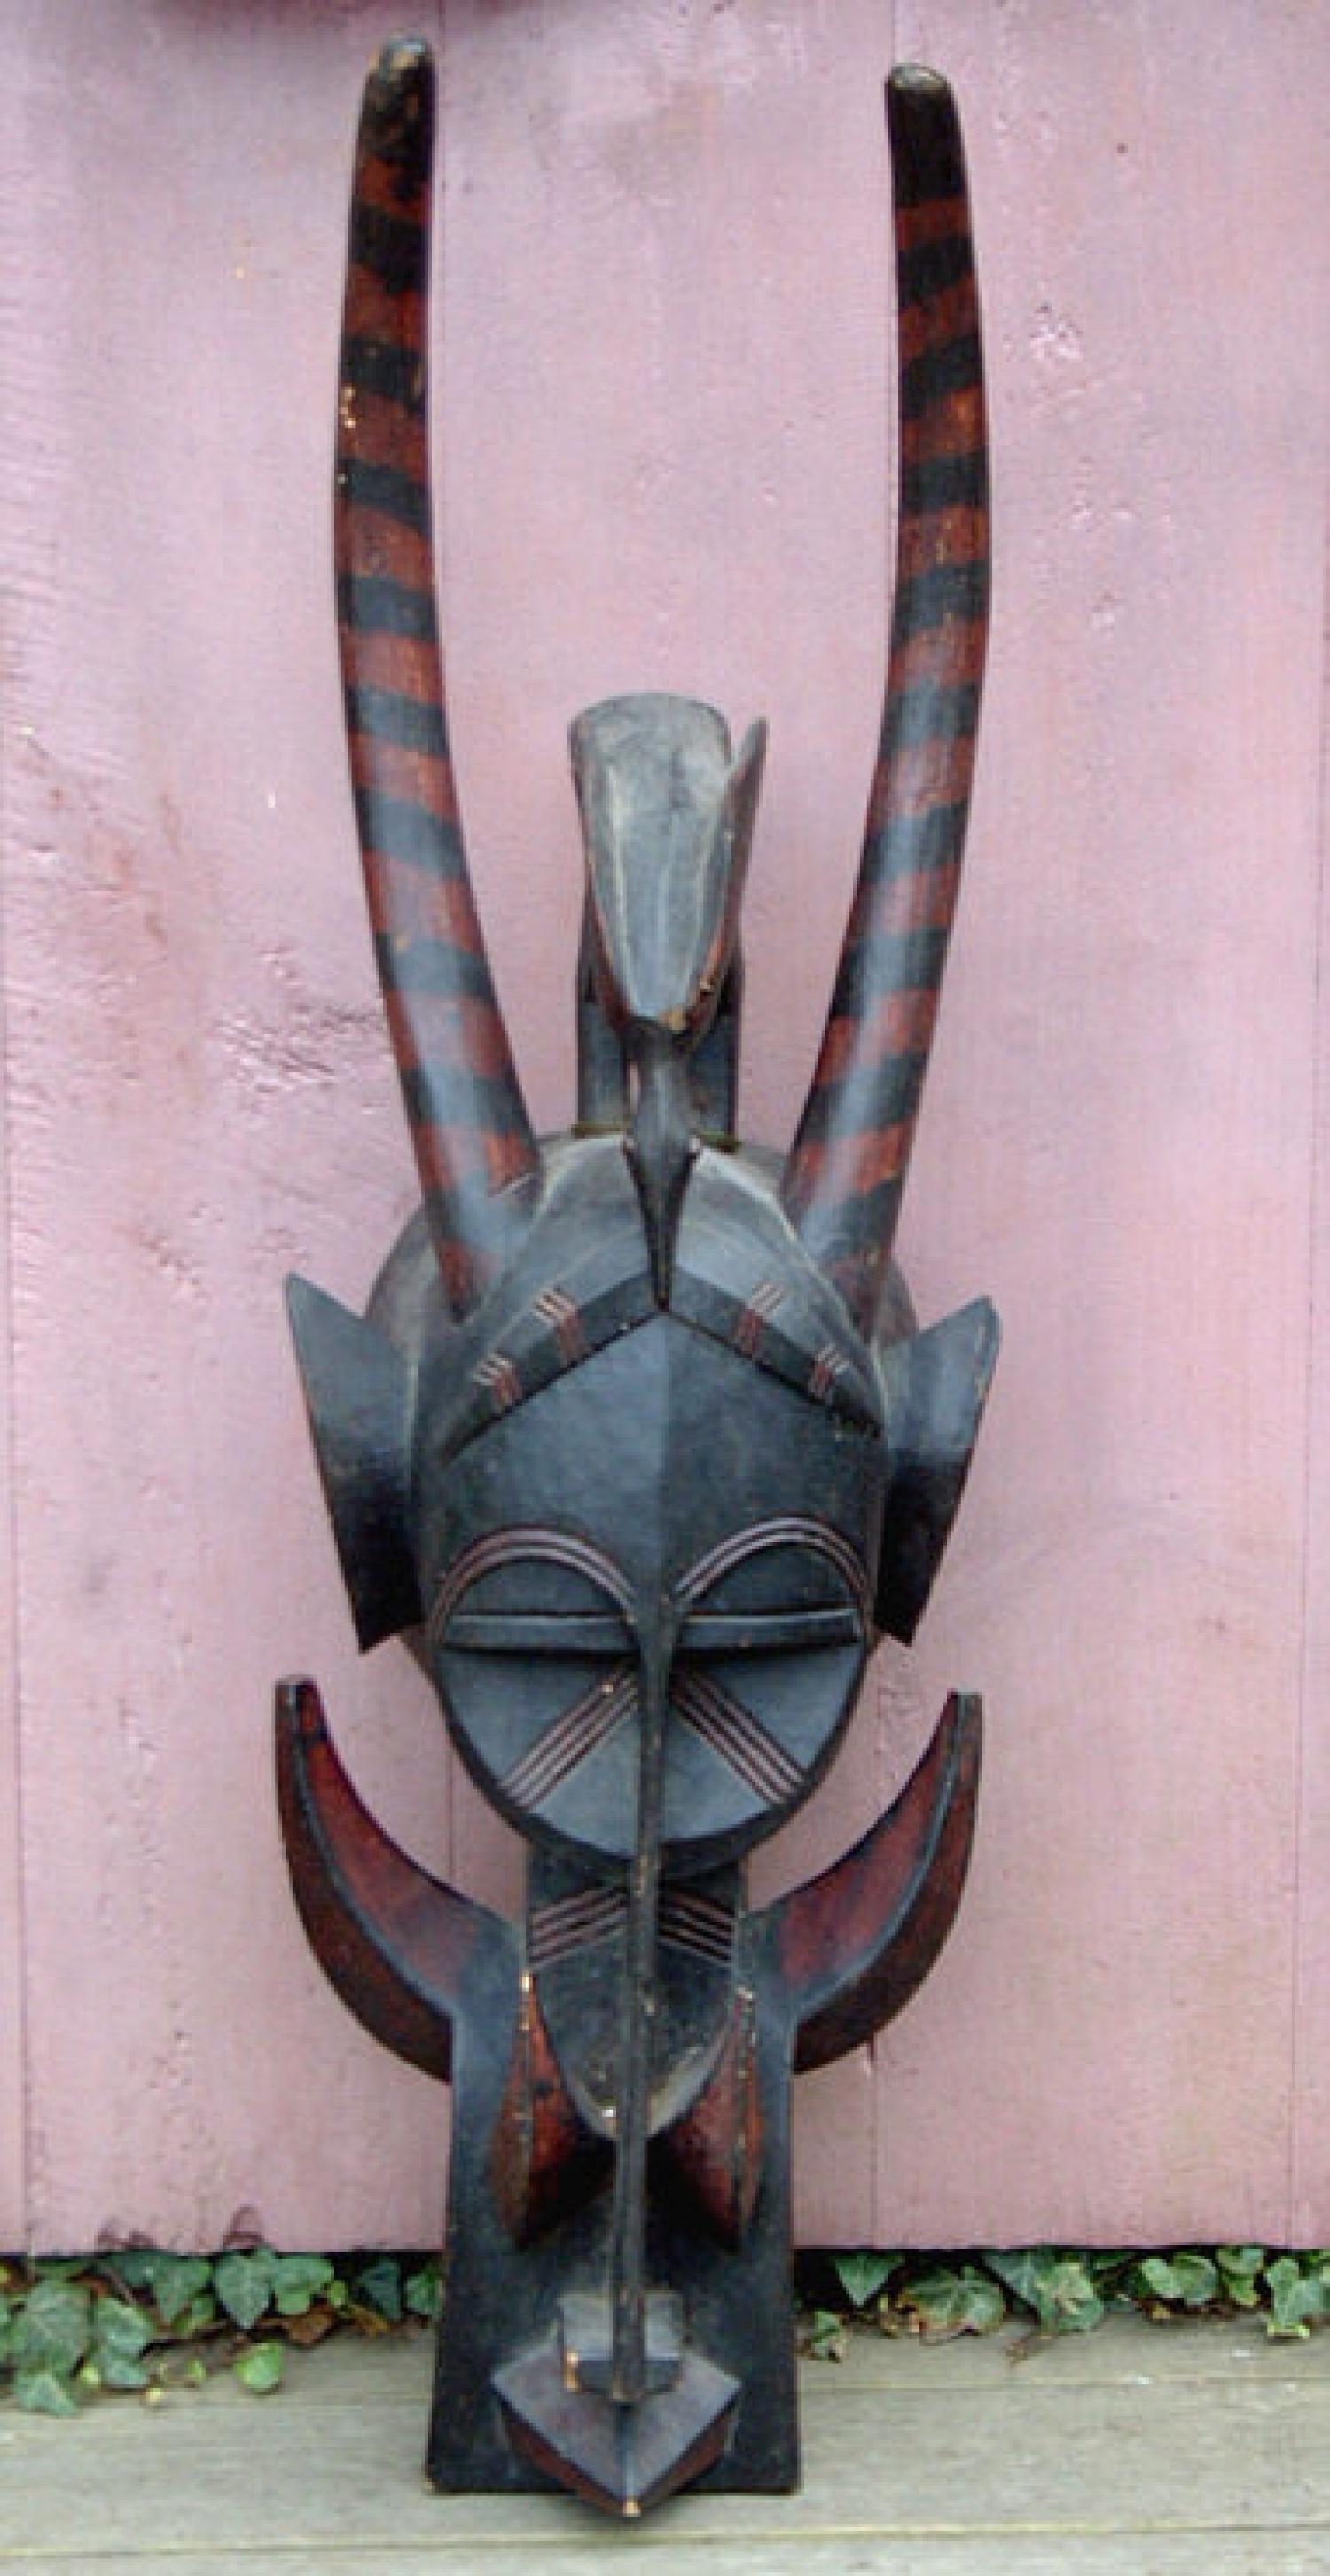 African tribal Ivory Coast firespitter mask